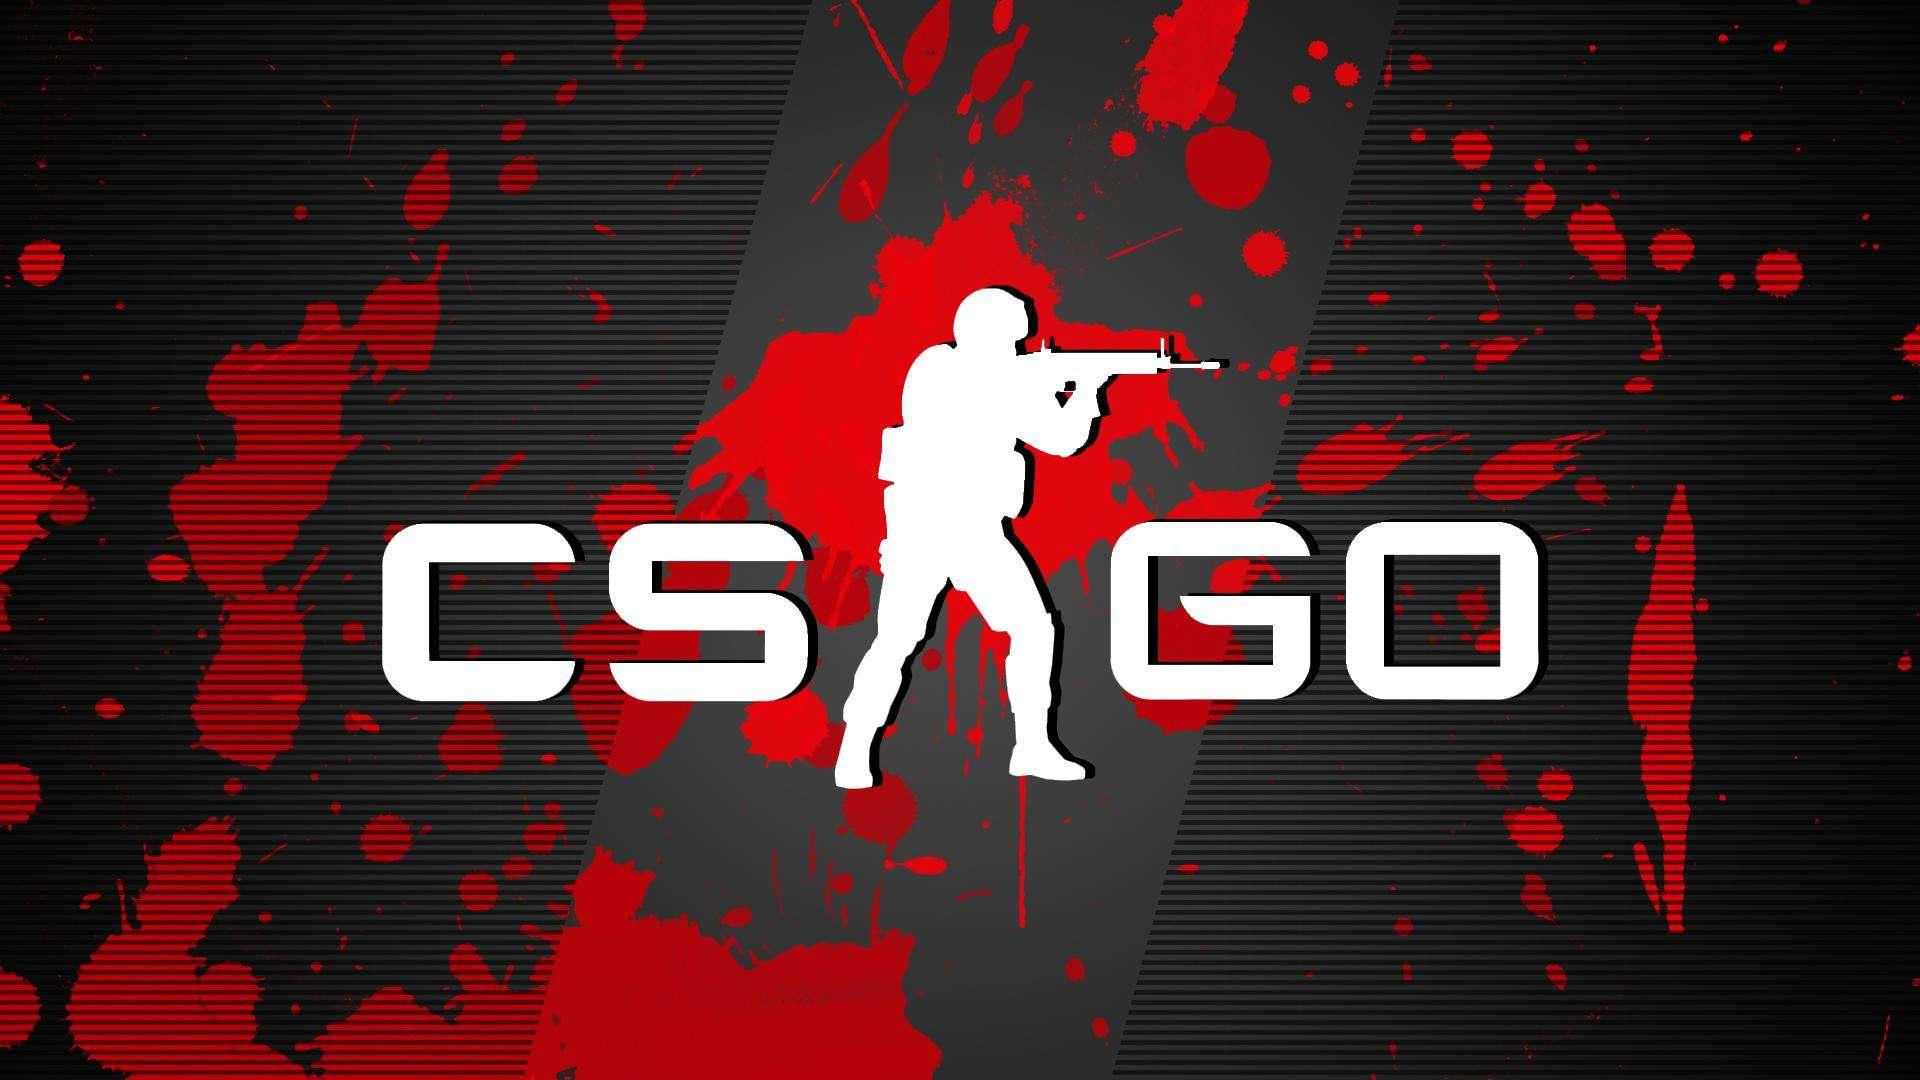 CSGO起源2什么时候上线_CSGO起源2更新时间介绍